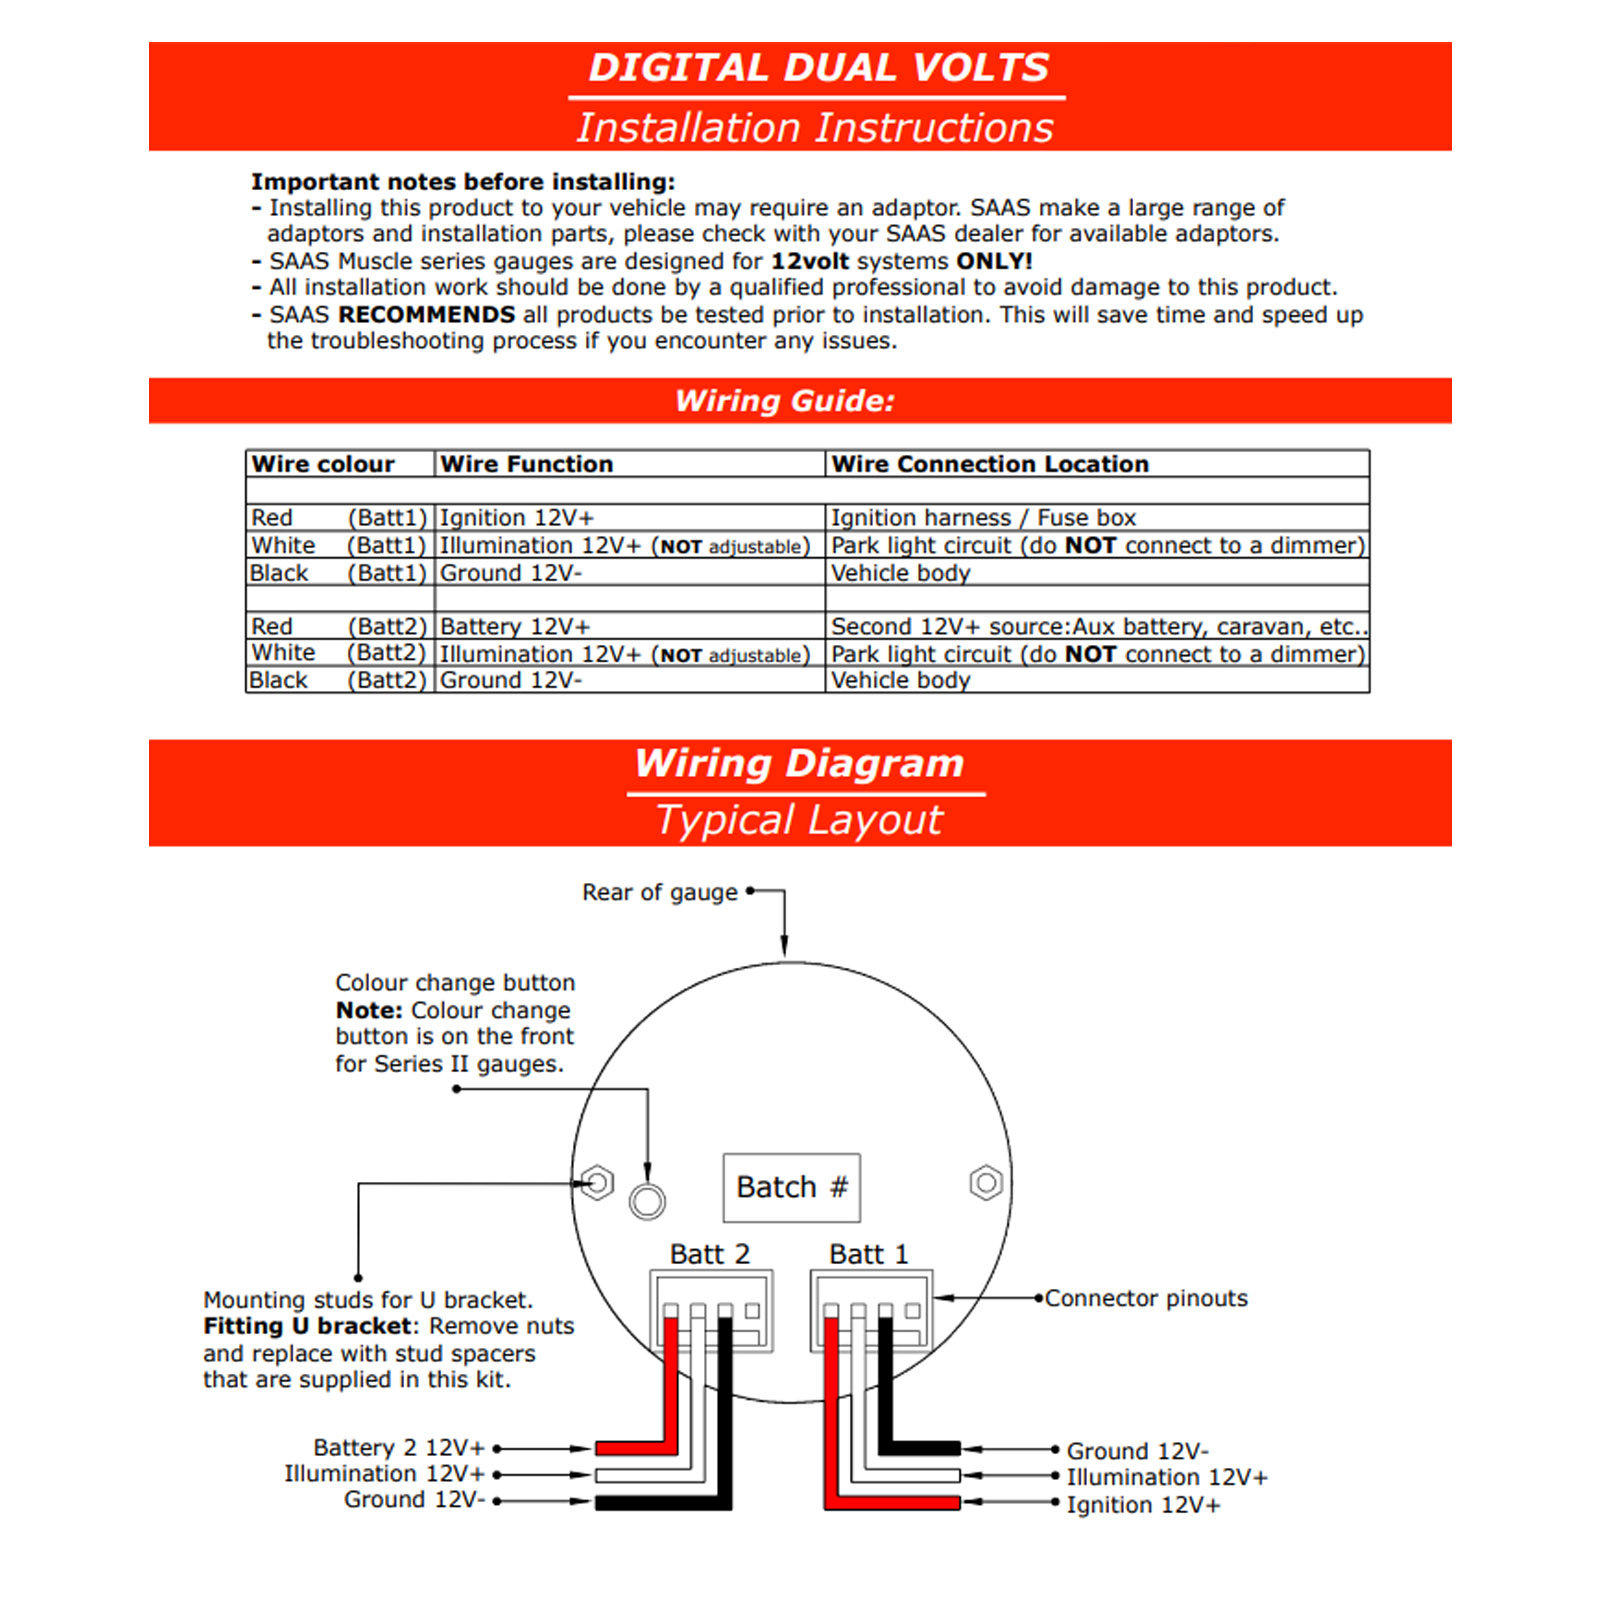 skyline r33 gtst wiring diagram yamaha qt50 pillar pod black turbo boost dual volts gauge for nissan gtr manufacturer